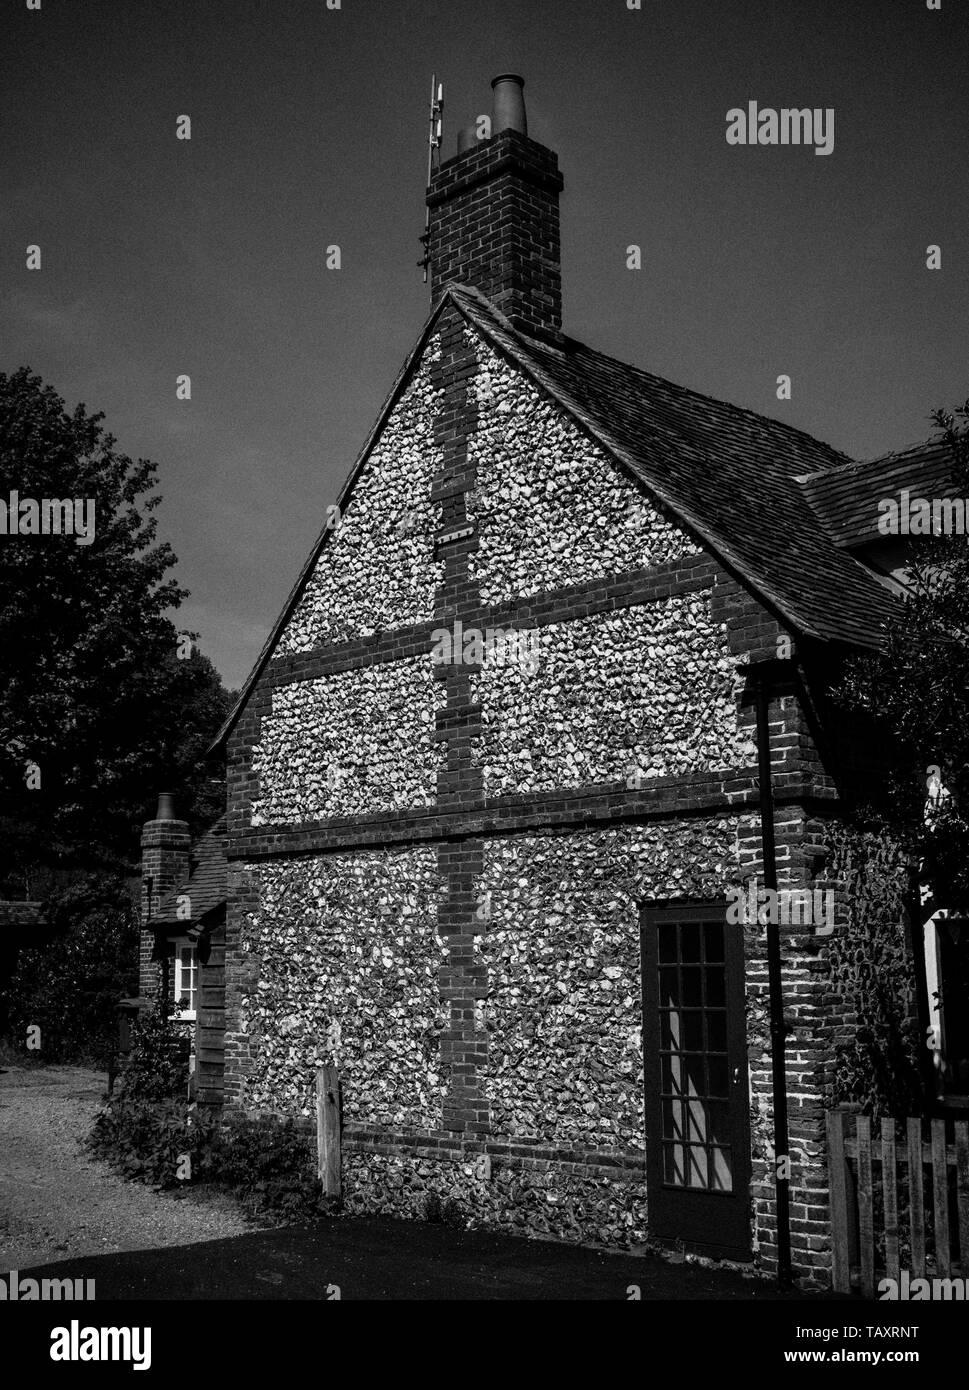 Dark House Black and White Photograph, of Stone House in Hambledon Village, Buckinghamshire, England, UK, GB. - Stock Image